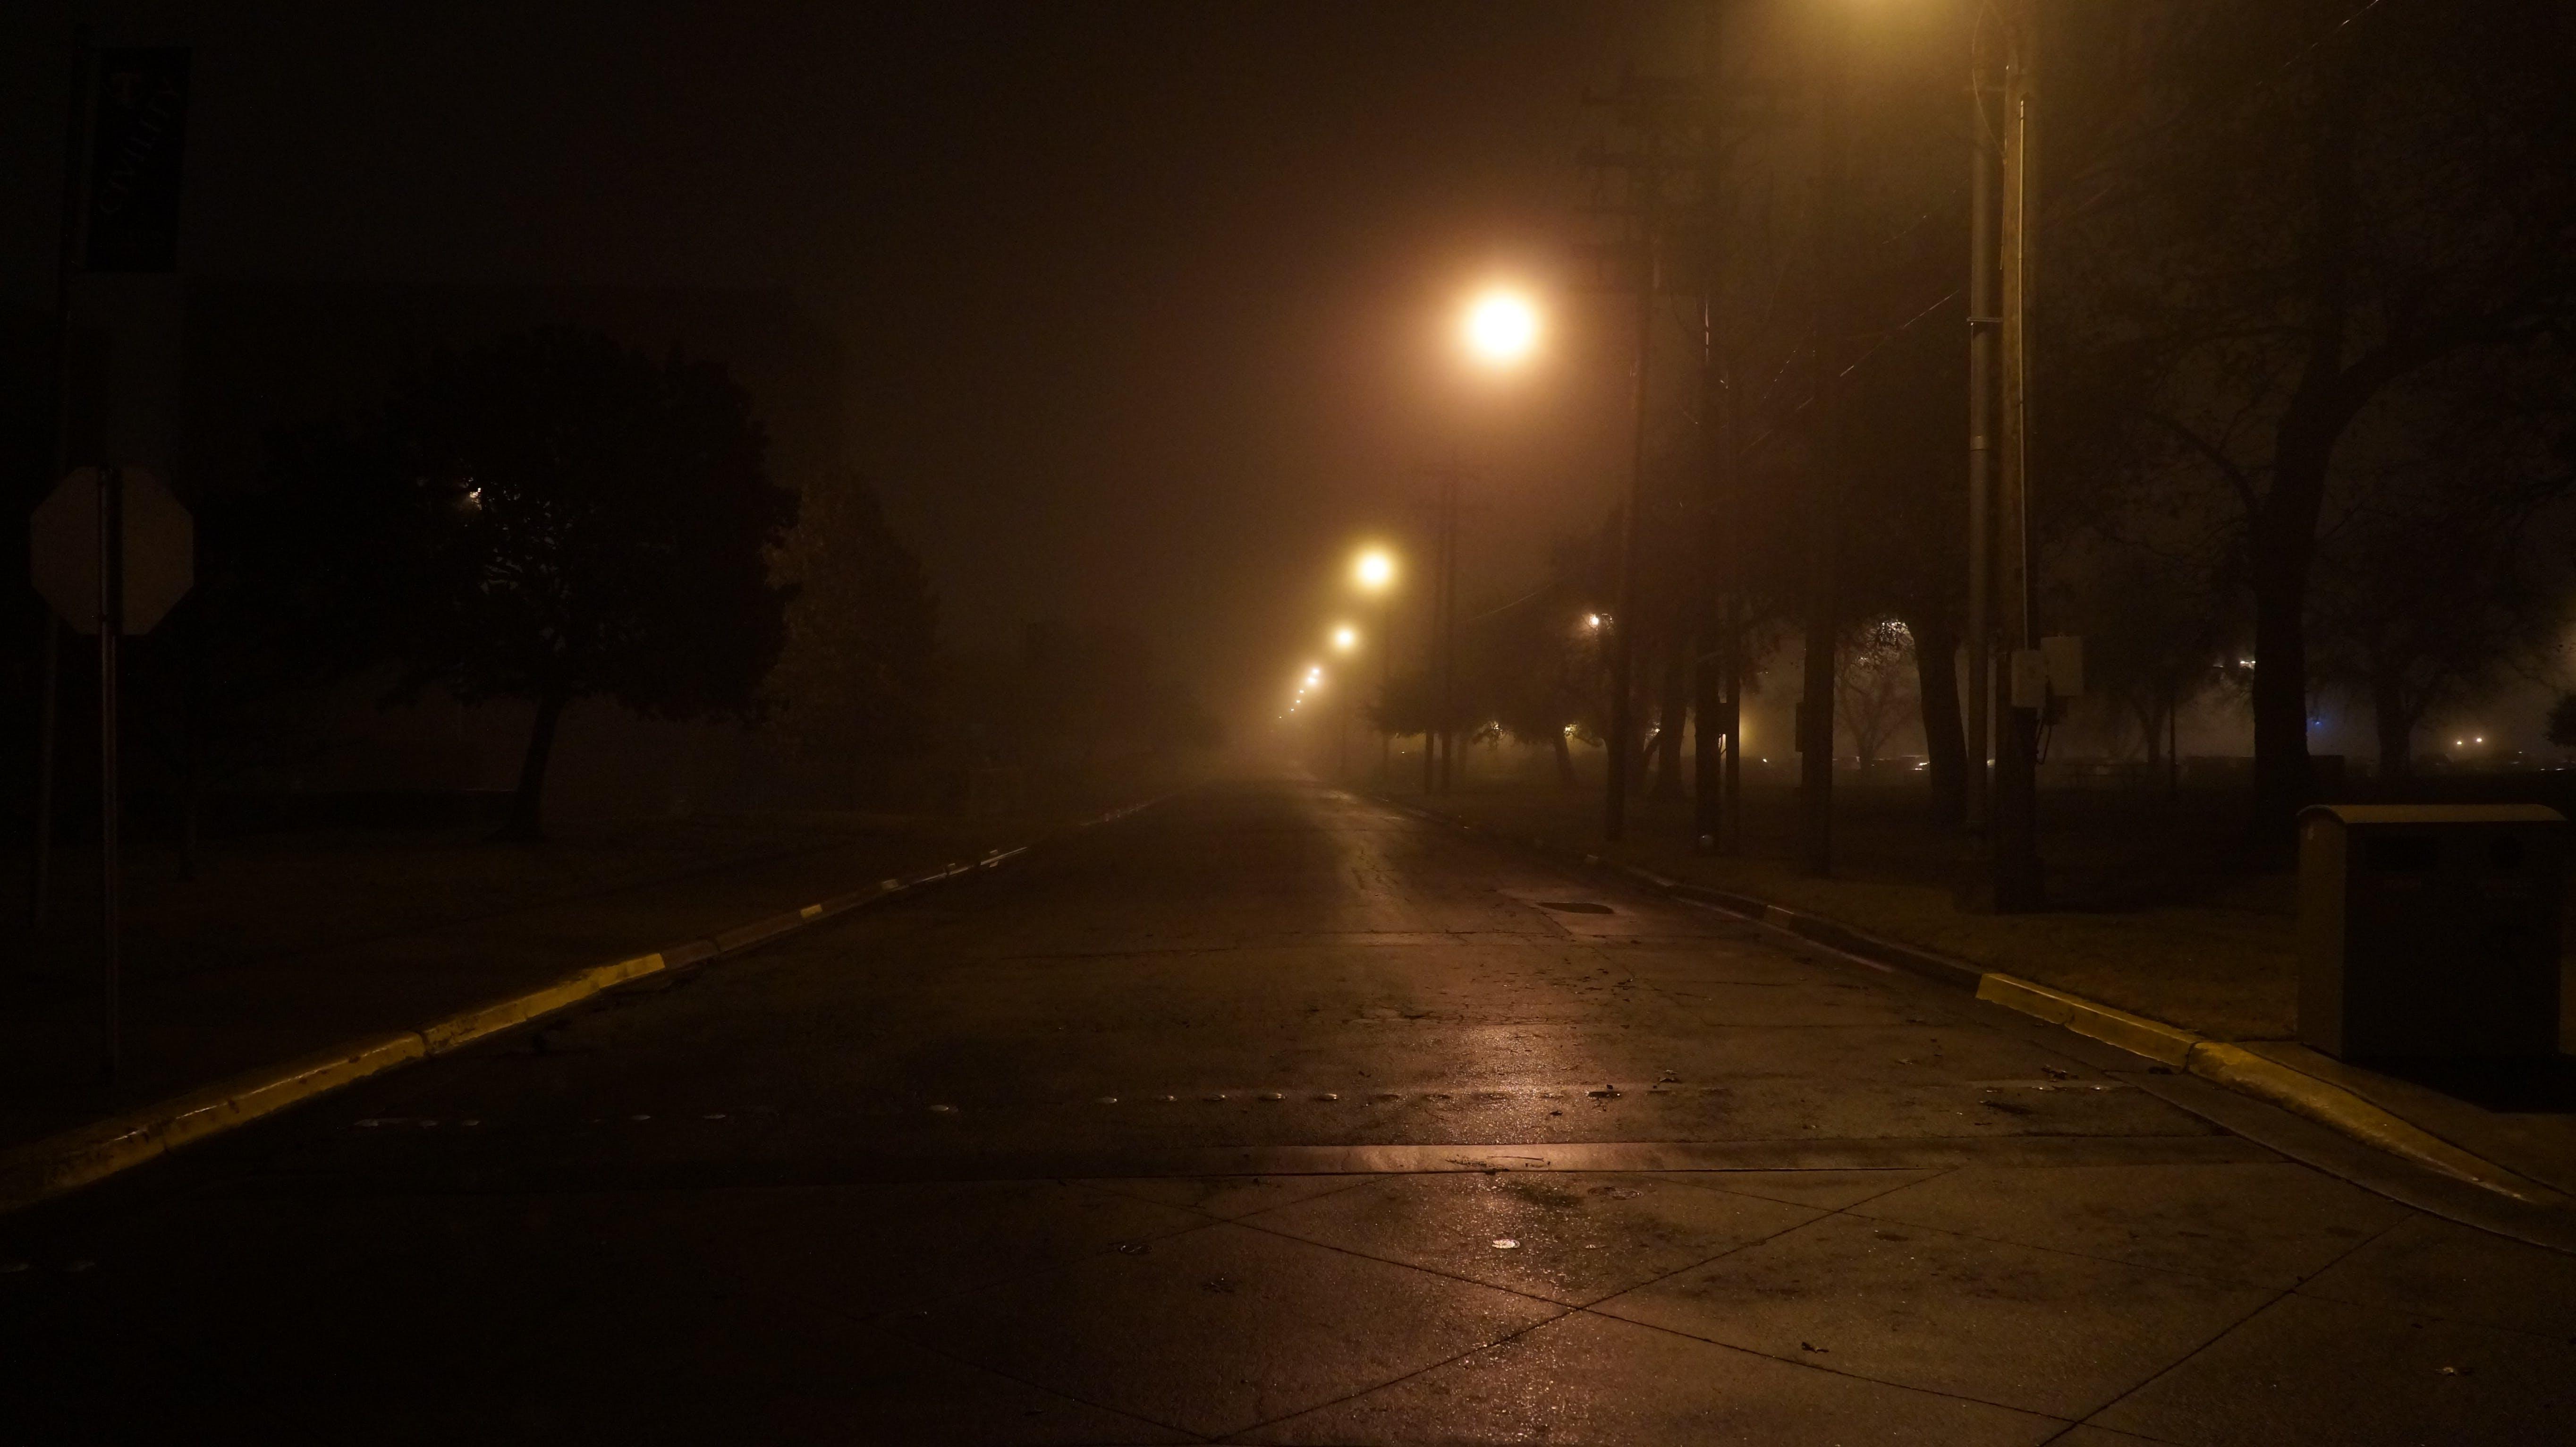 Free stock photo of creepy, damp, dark, foggy